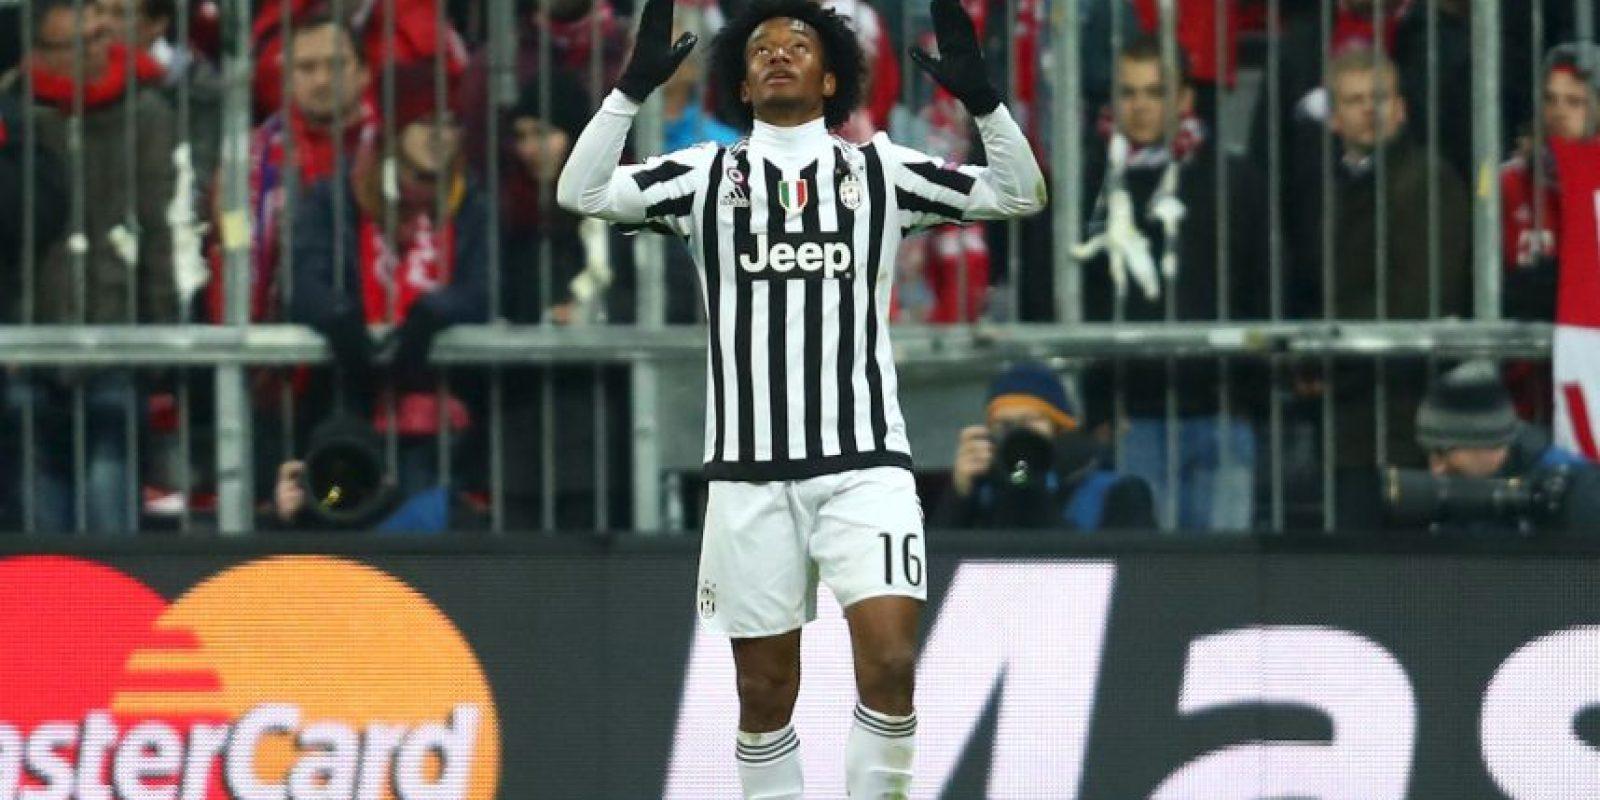 Juventus Foto:Getty Images